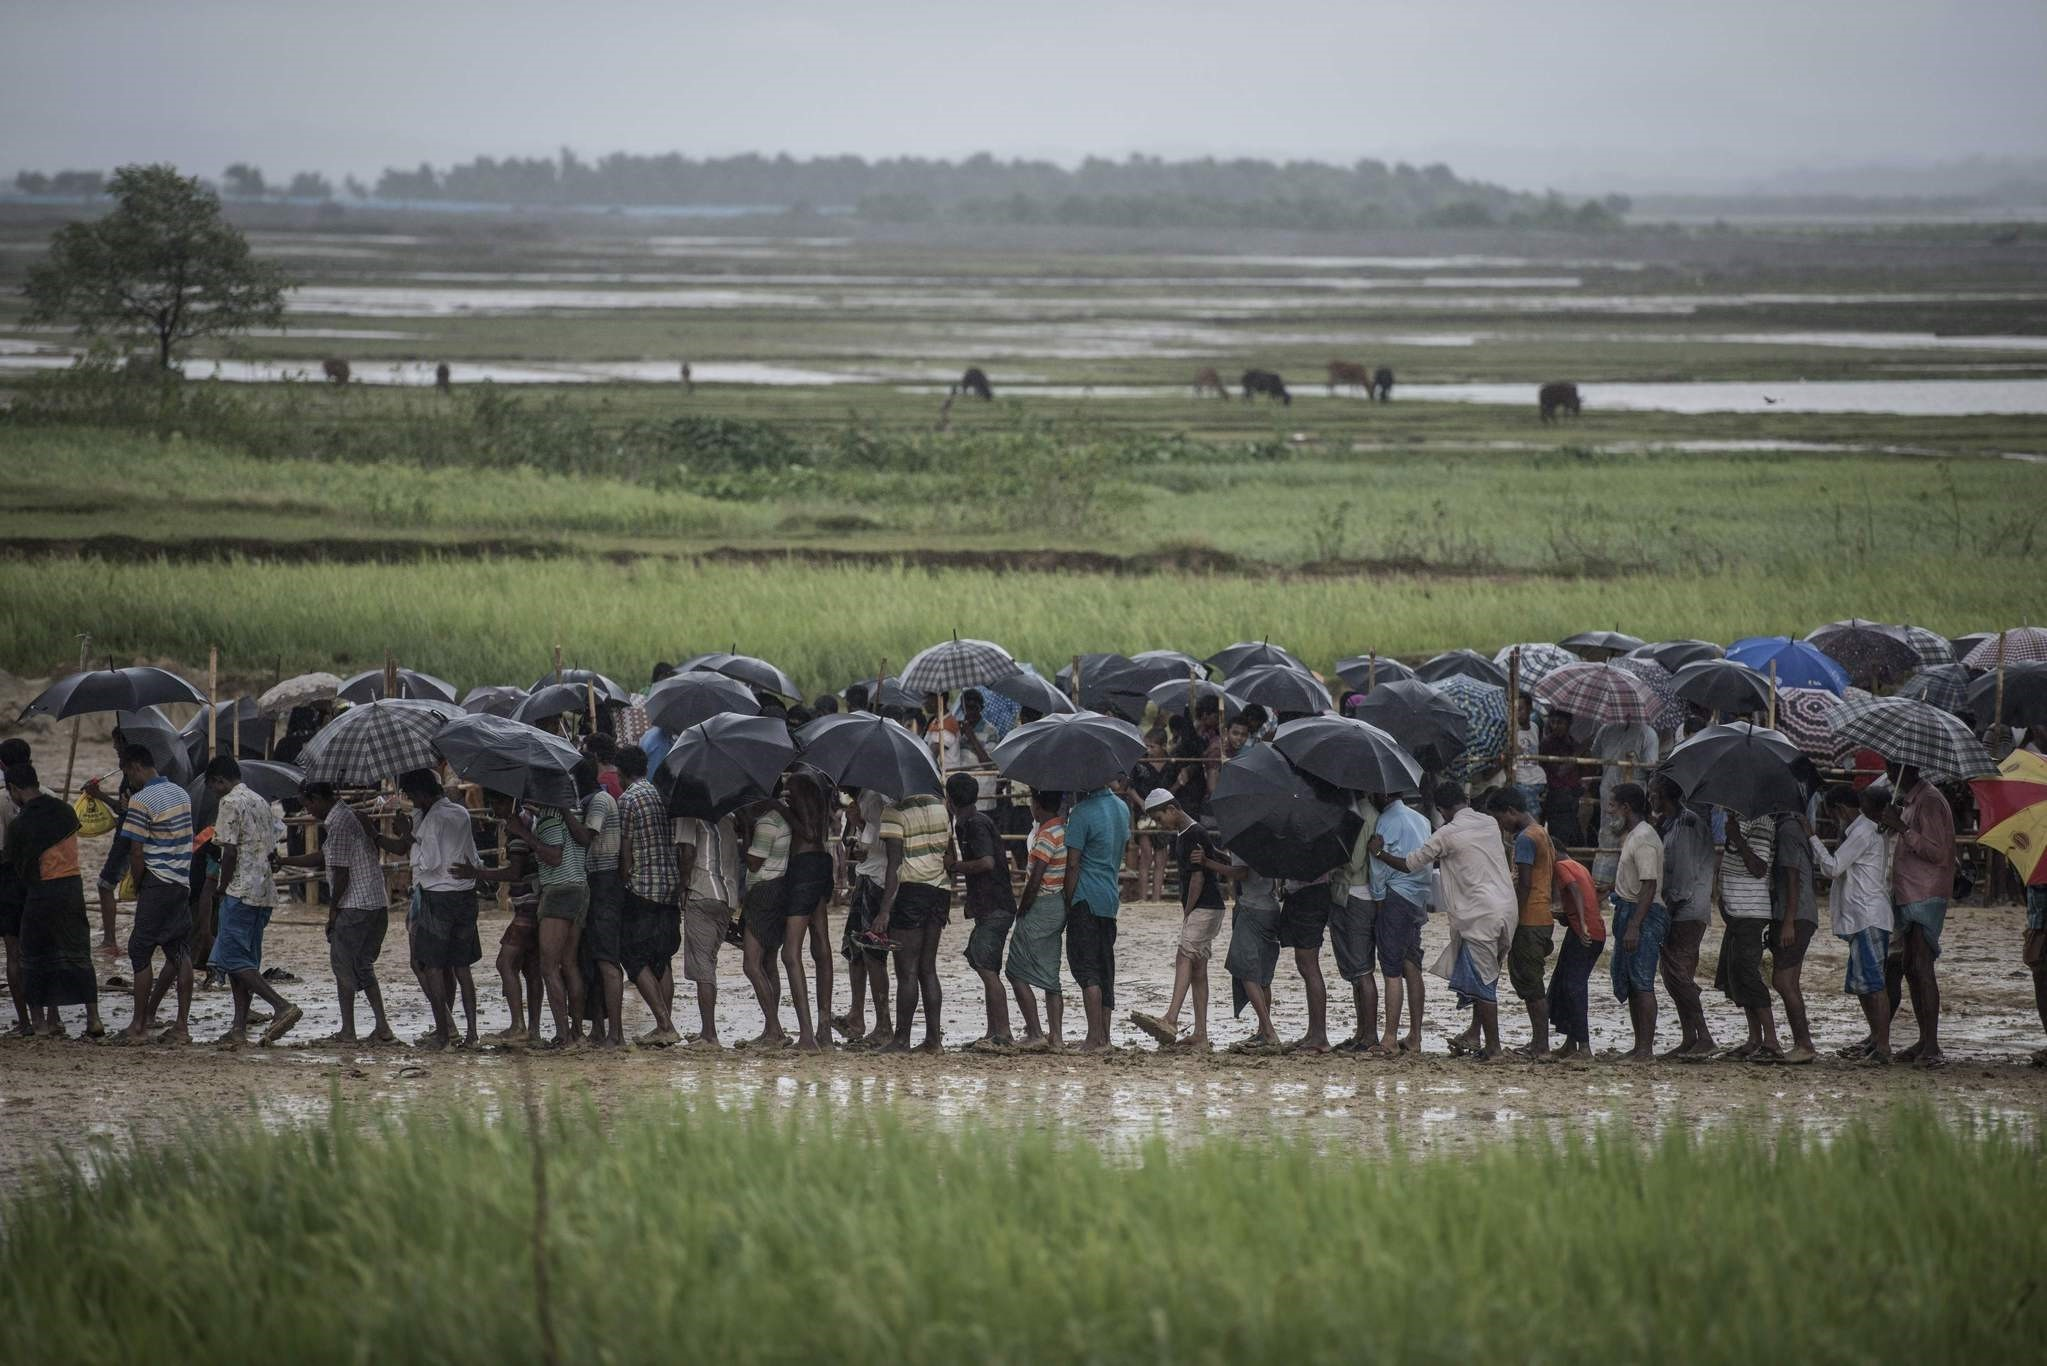 Rohingya Muslim refugees wait in line in the rain for food at the Nayapara refugee camp, Bangladesh.